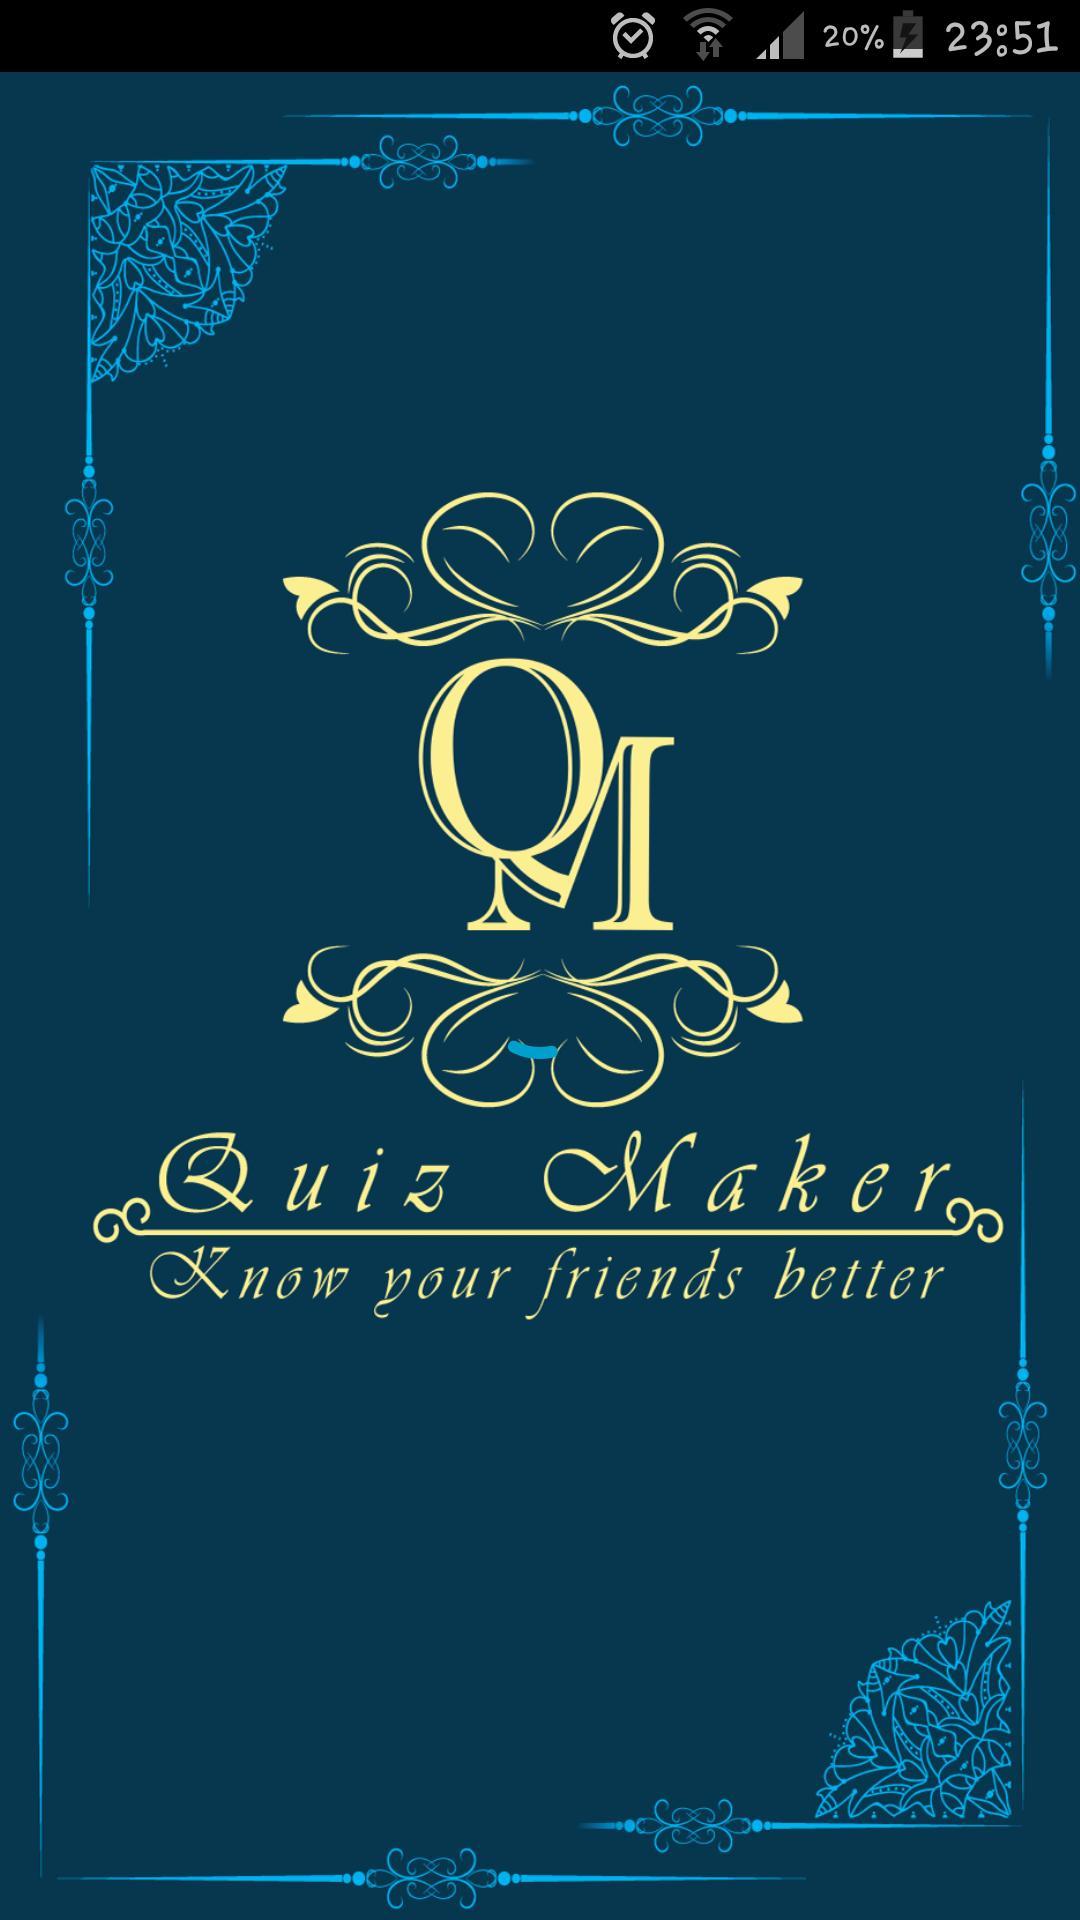 Android Için Quizup Maker - Quiz Tes Amis - Apk'yı İndir avec Quiz En Ligne Gratuit